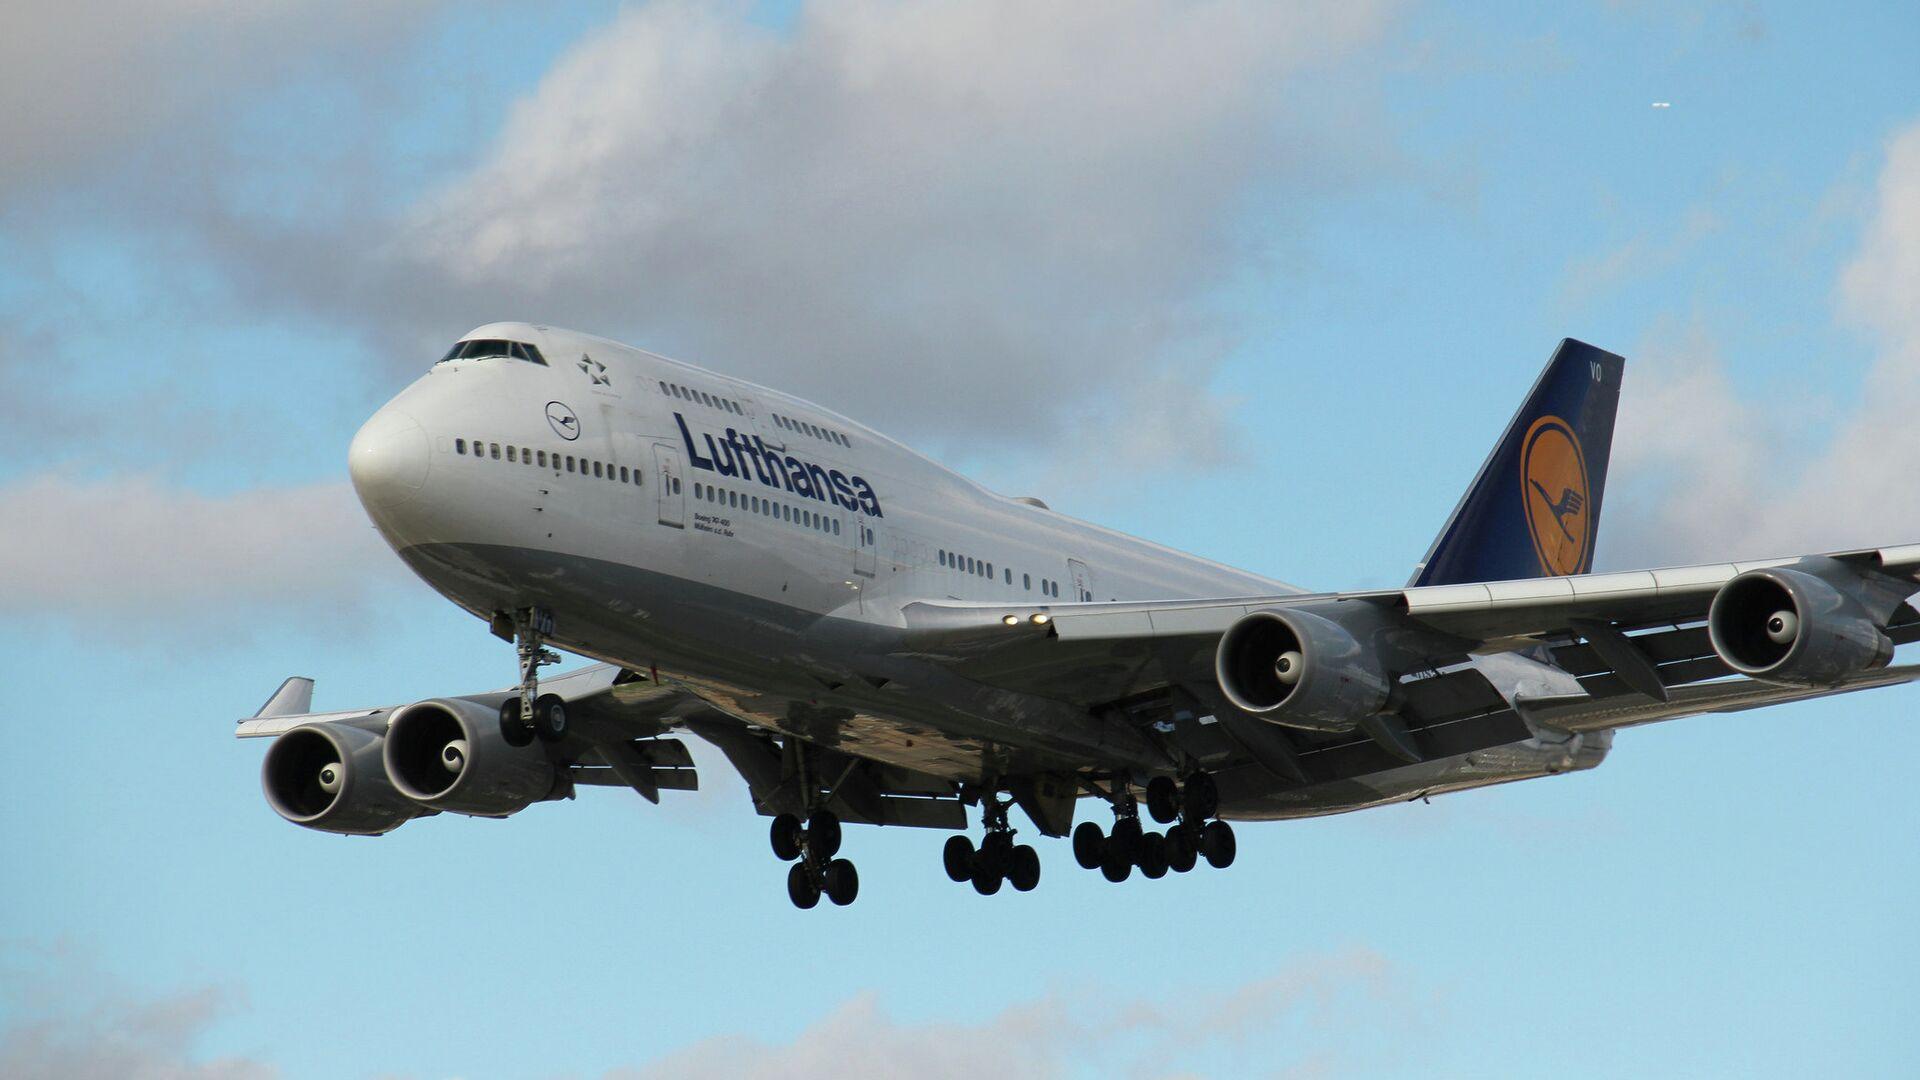 Lufthansa Boeing 747-400 - Sputnik Česká republika, 1920, 24.05.2021